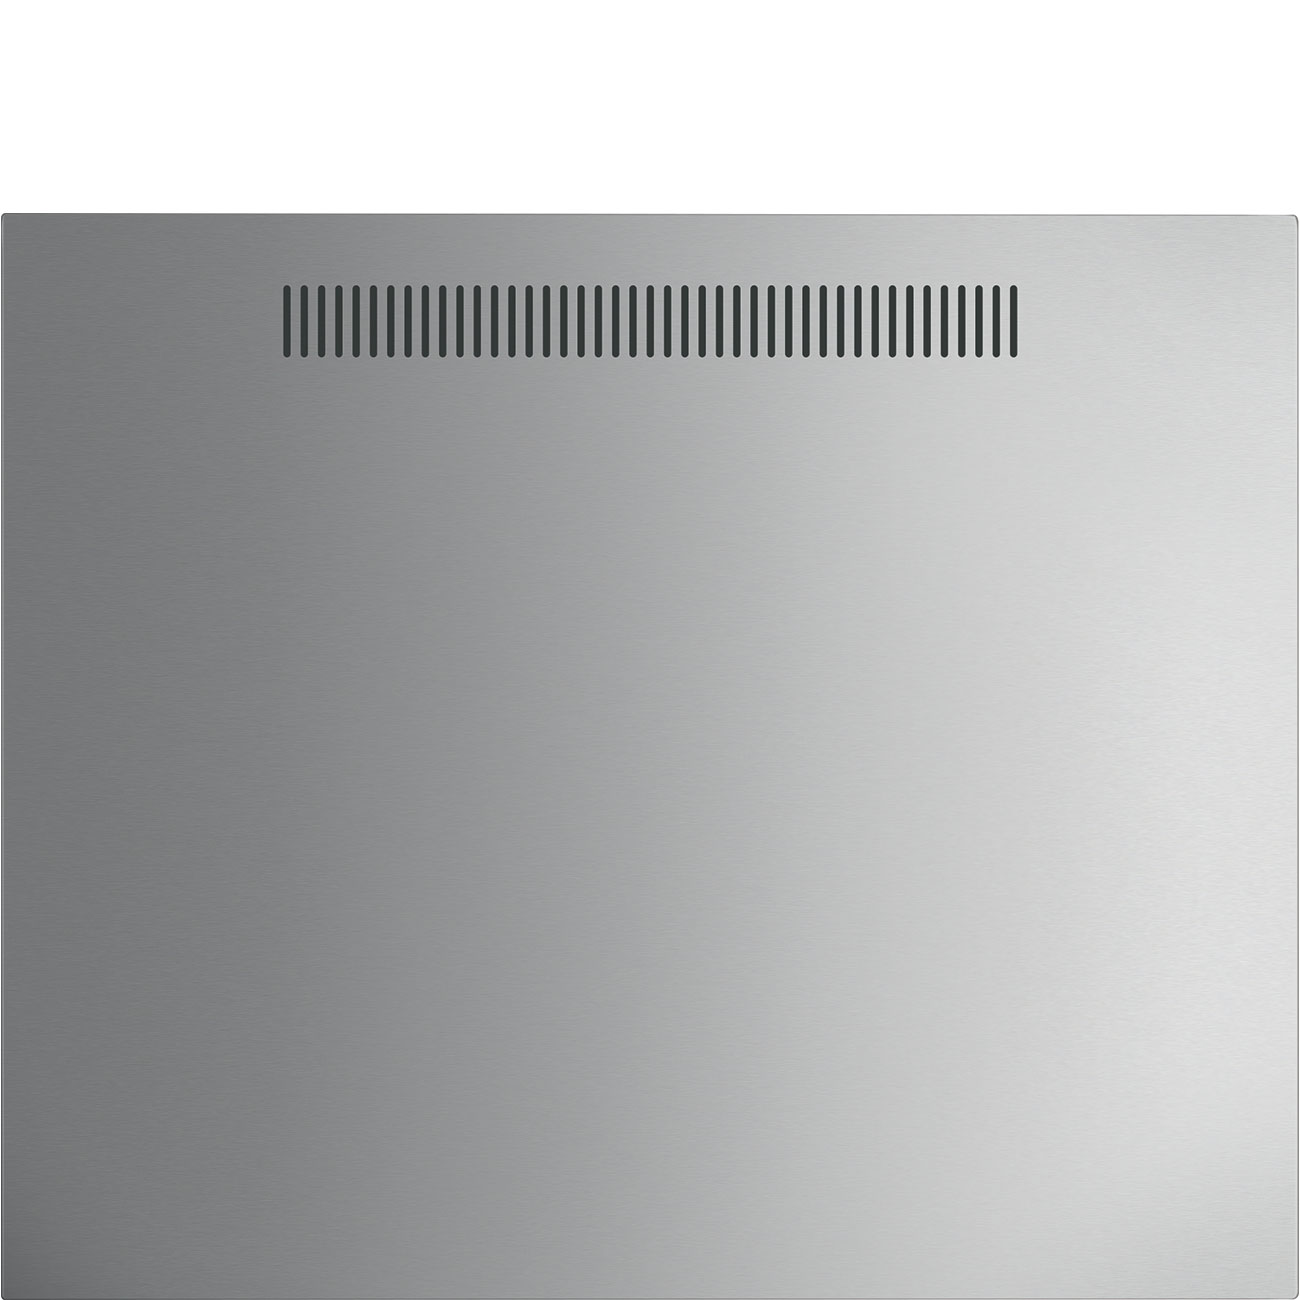 KIT1A2PYID-81.jpg